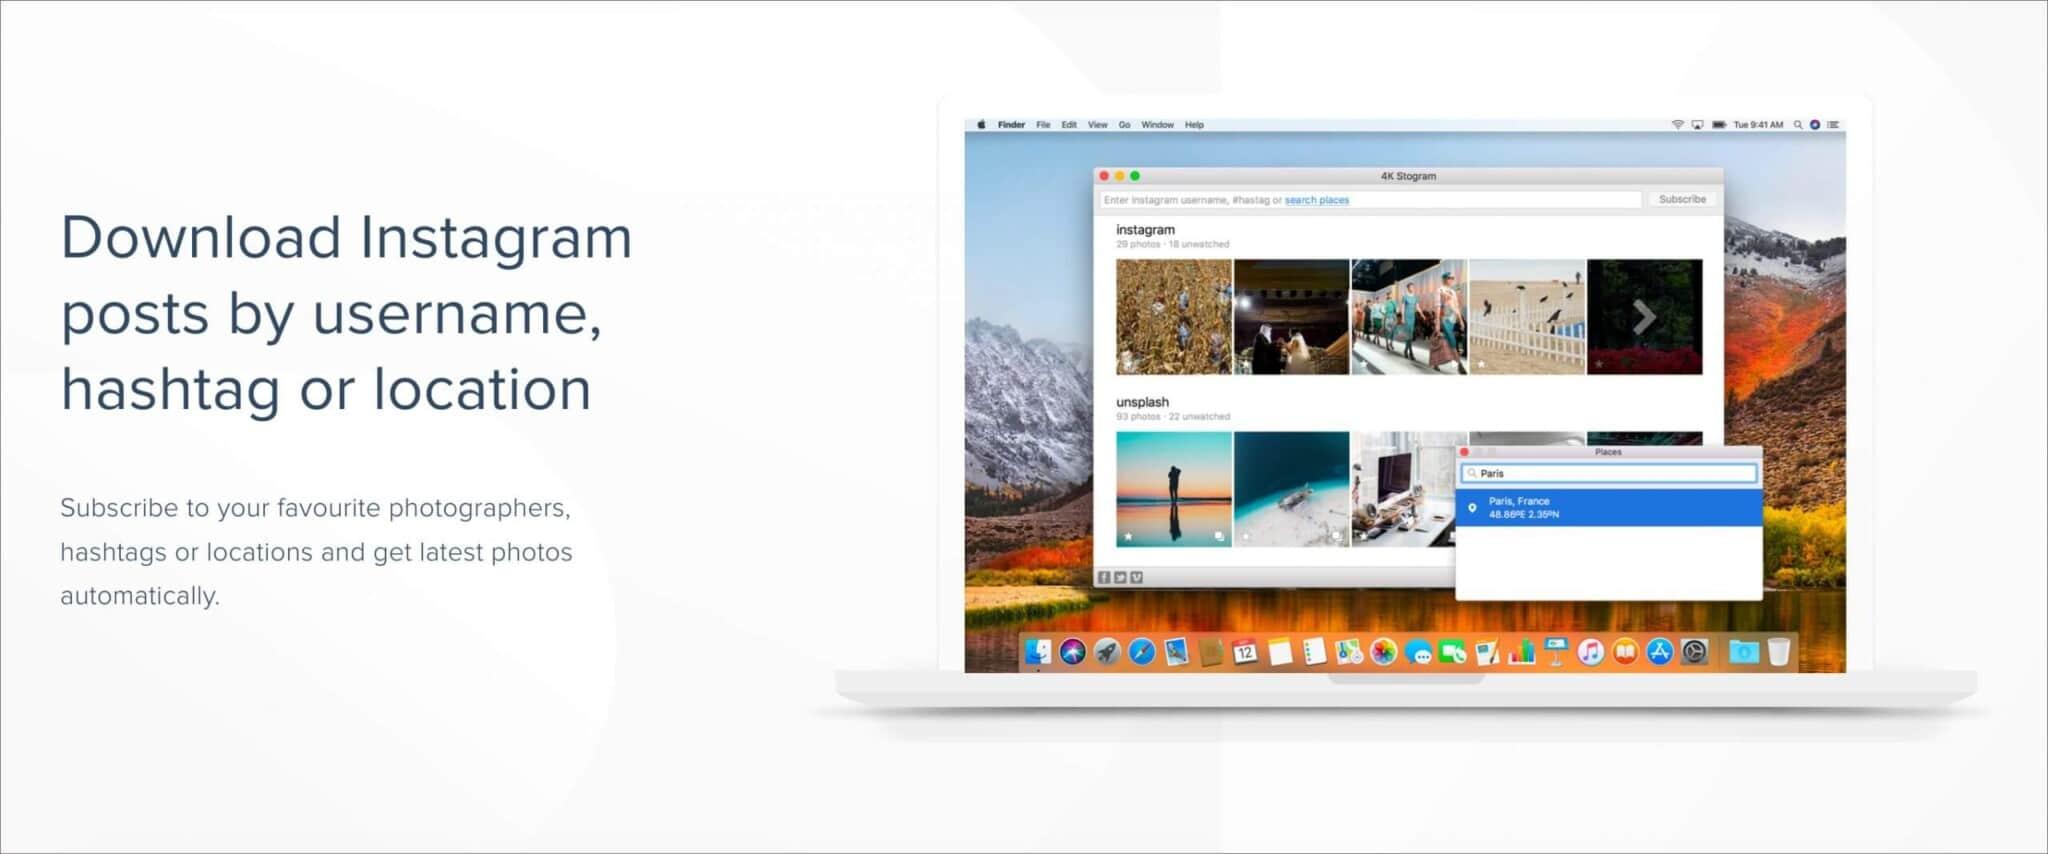 4K Stogram Features